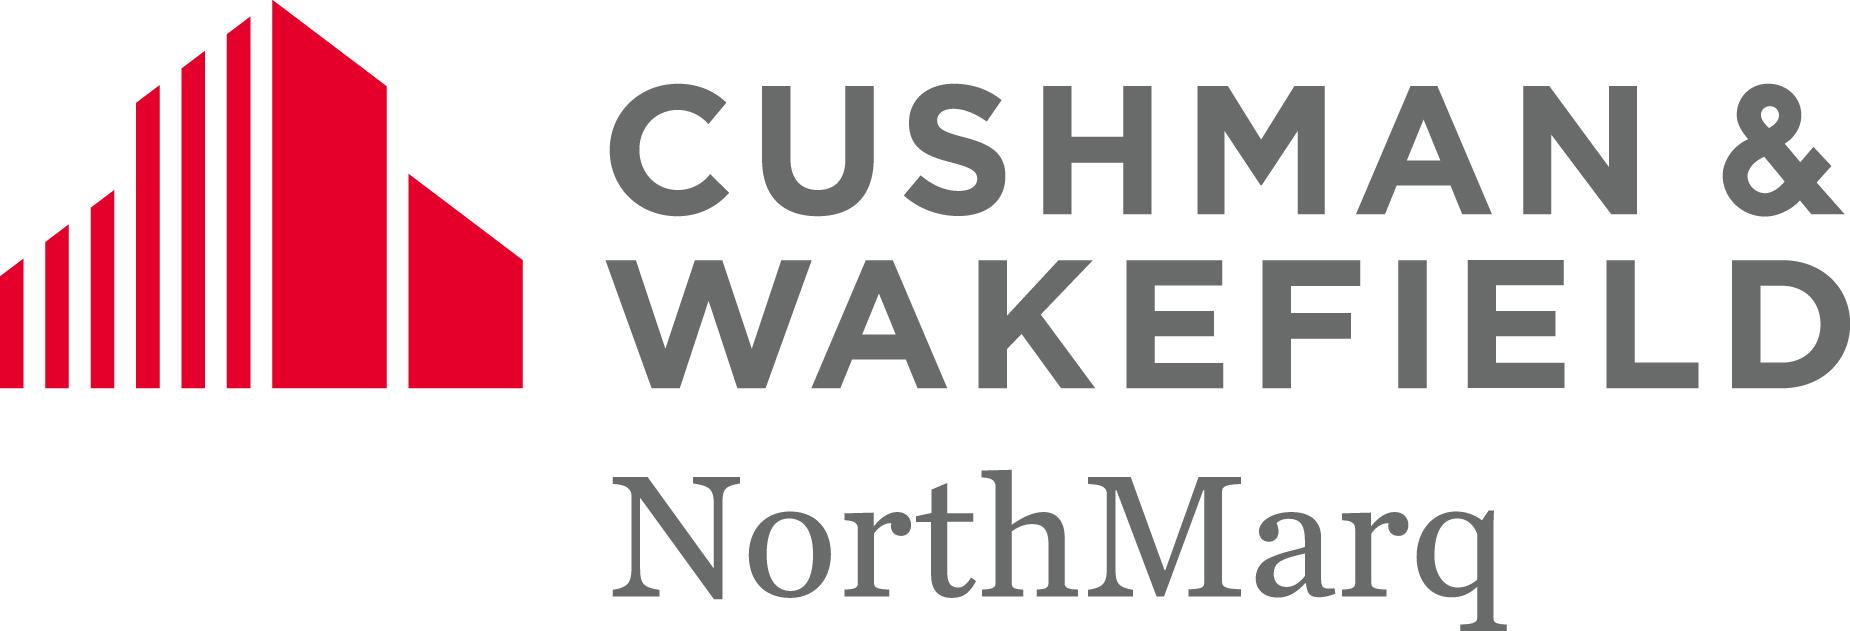 Cushman & Wakefield/NorthMarq